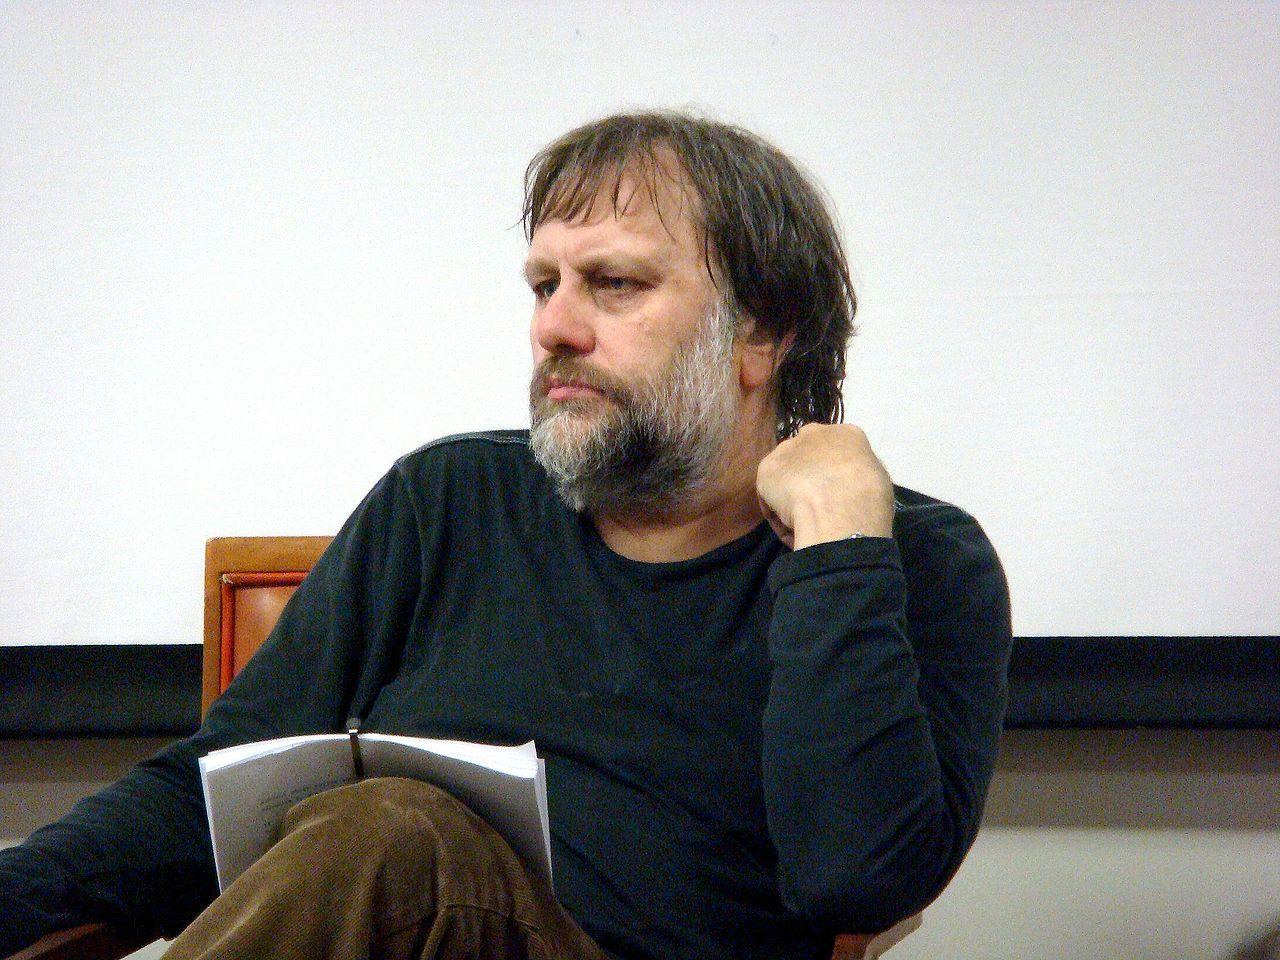 Philosopher Slavoj Žižek to Speak at Golden Drum 2019